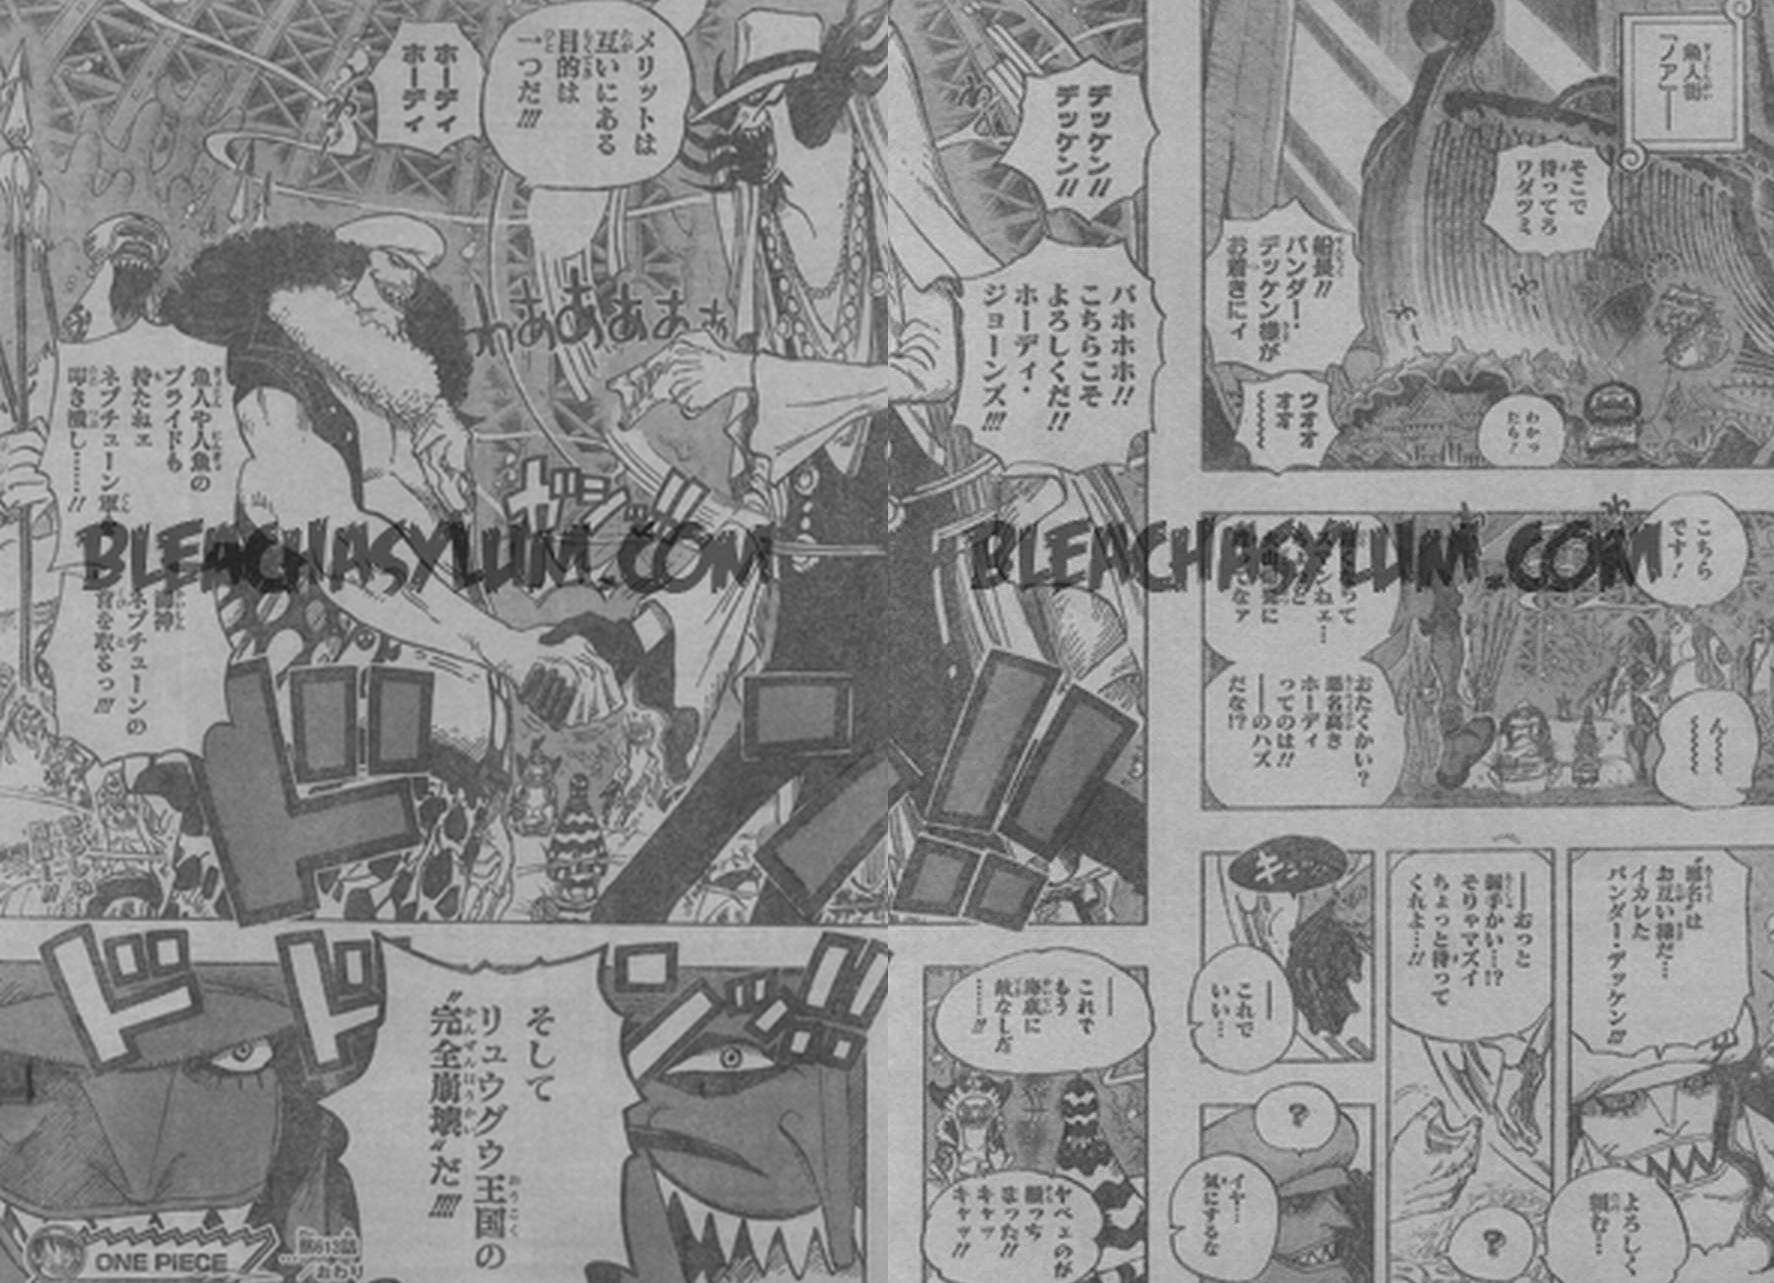 One Piece Manga 613 Spoiler Pics 0811